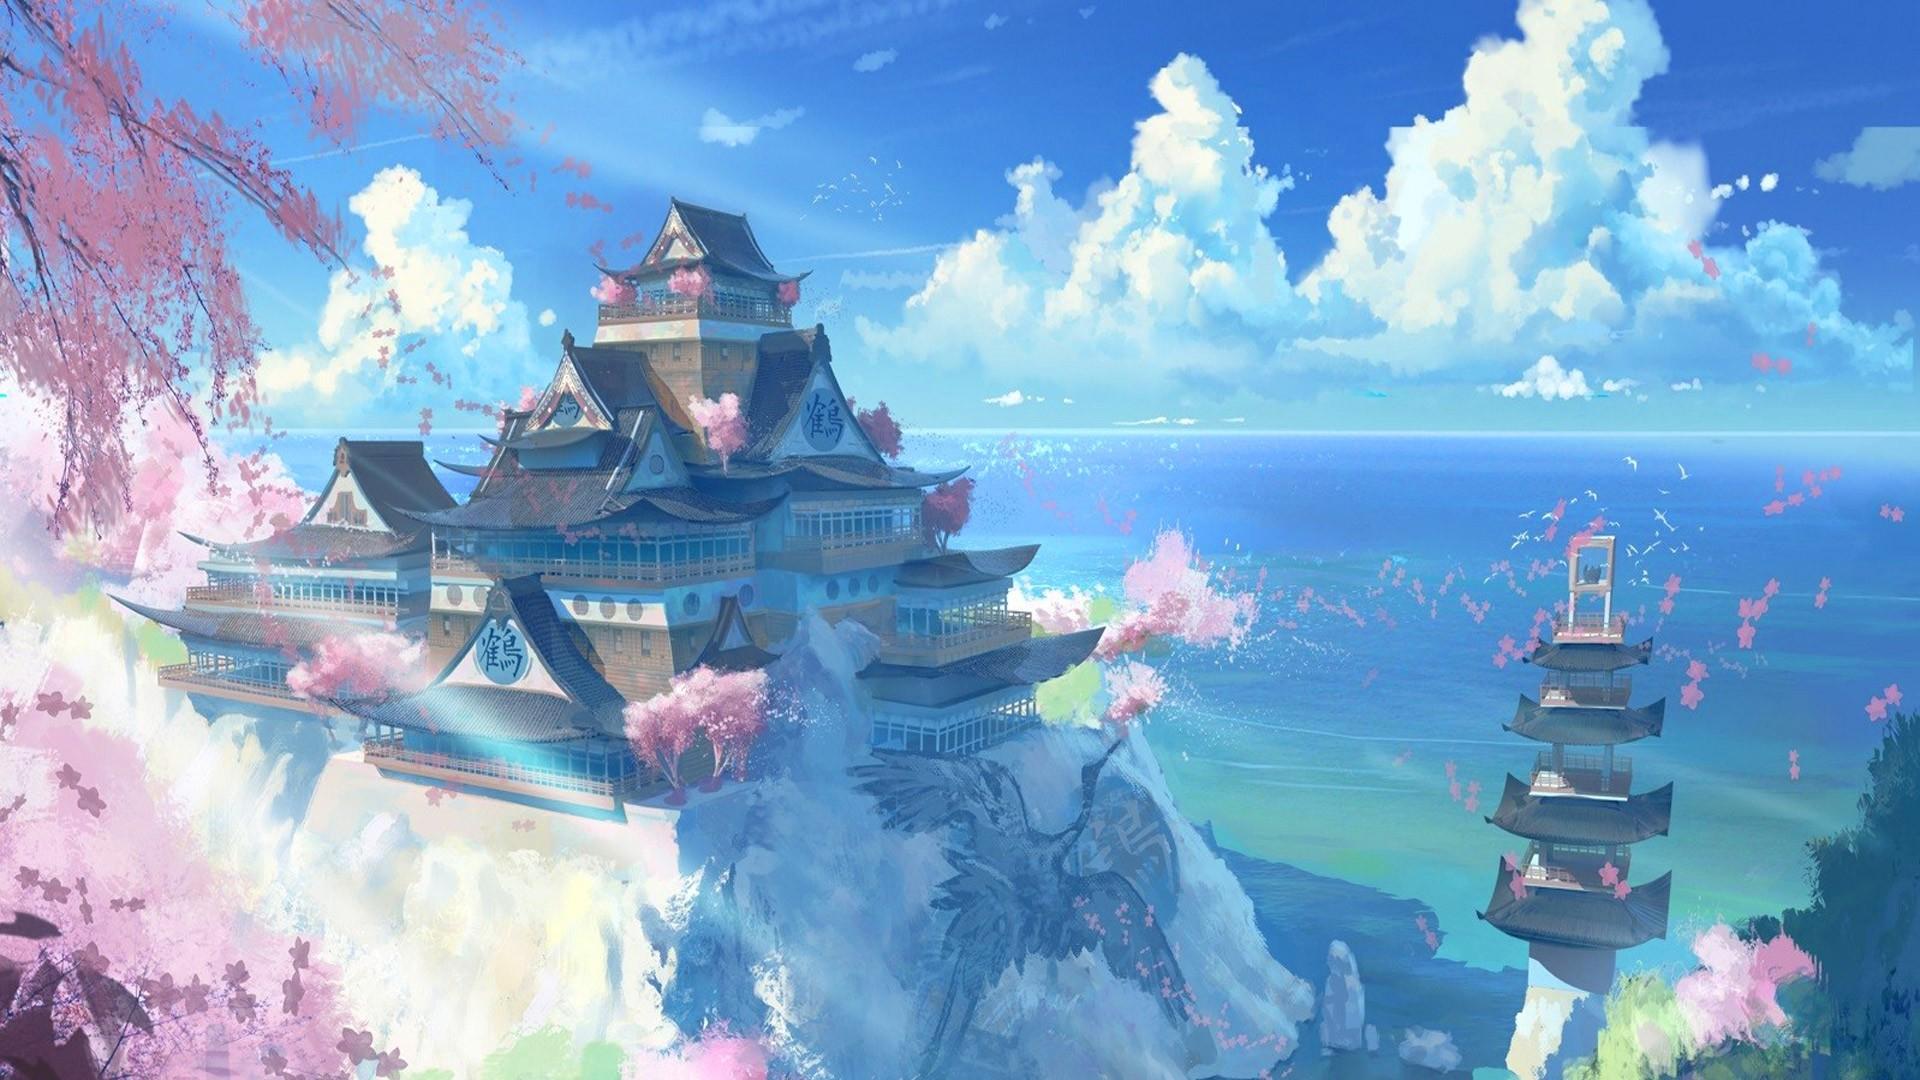 Res: 1920x1080, Best of Animated Japanese Desktop Wallpaper Gallery - Free Japan Temple  Scenery Anime Manga puter desktop